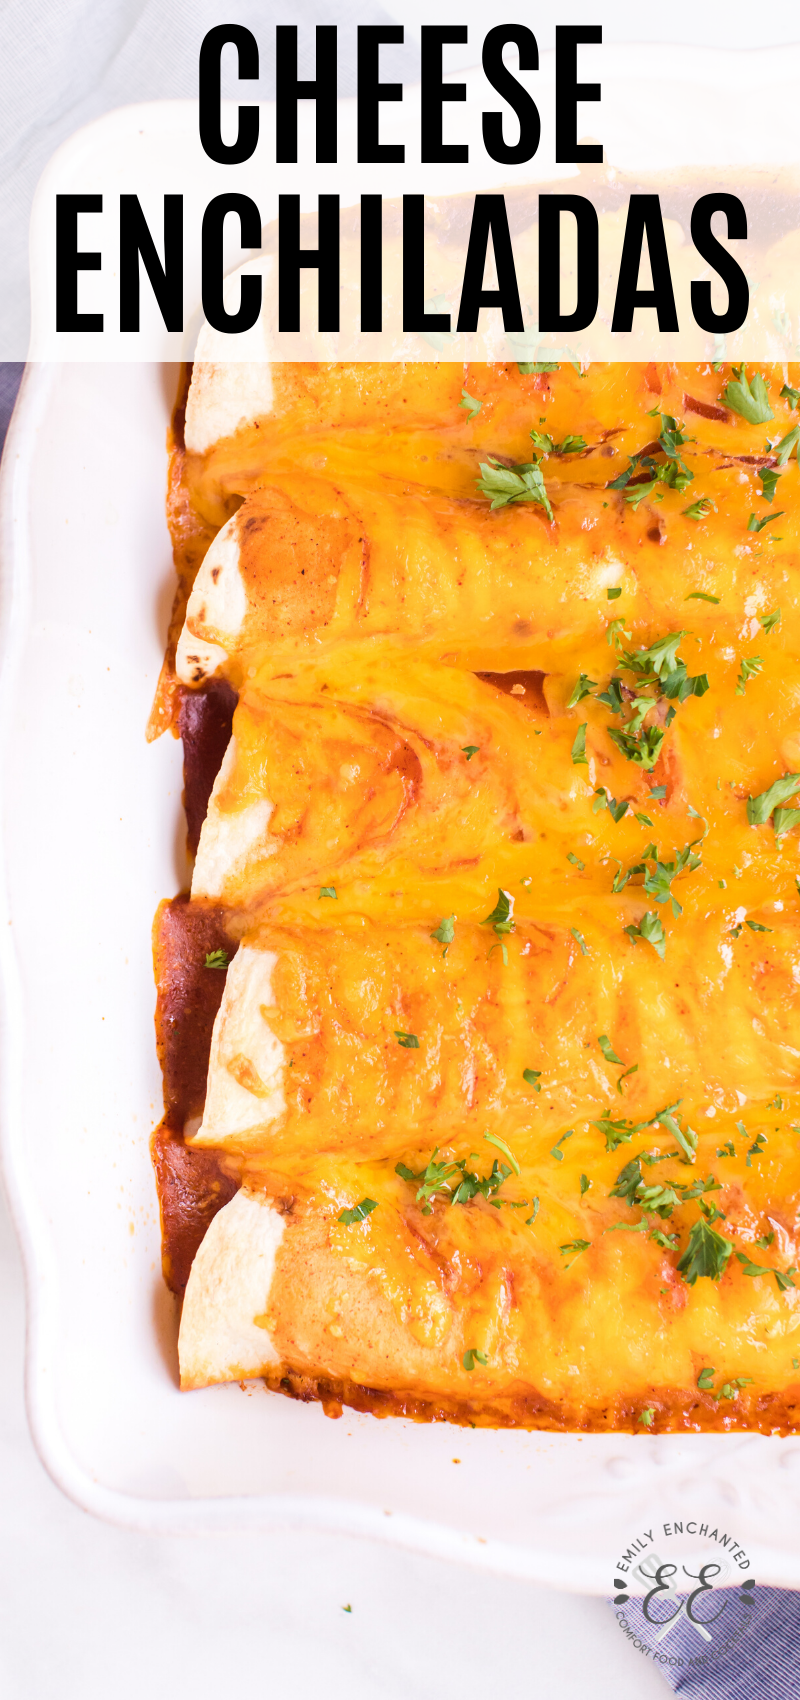 Easy Cheese Enchiladas Recipe With Sour Cream And Enchilada Sauce In 2020 Recipes With Enchilada Sauce Cheese Enchiladas Best Mexican Recipes